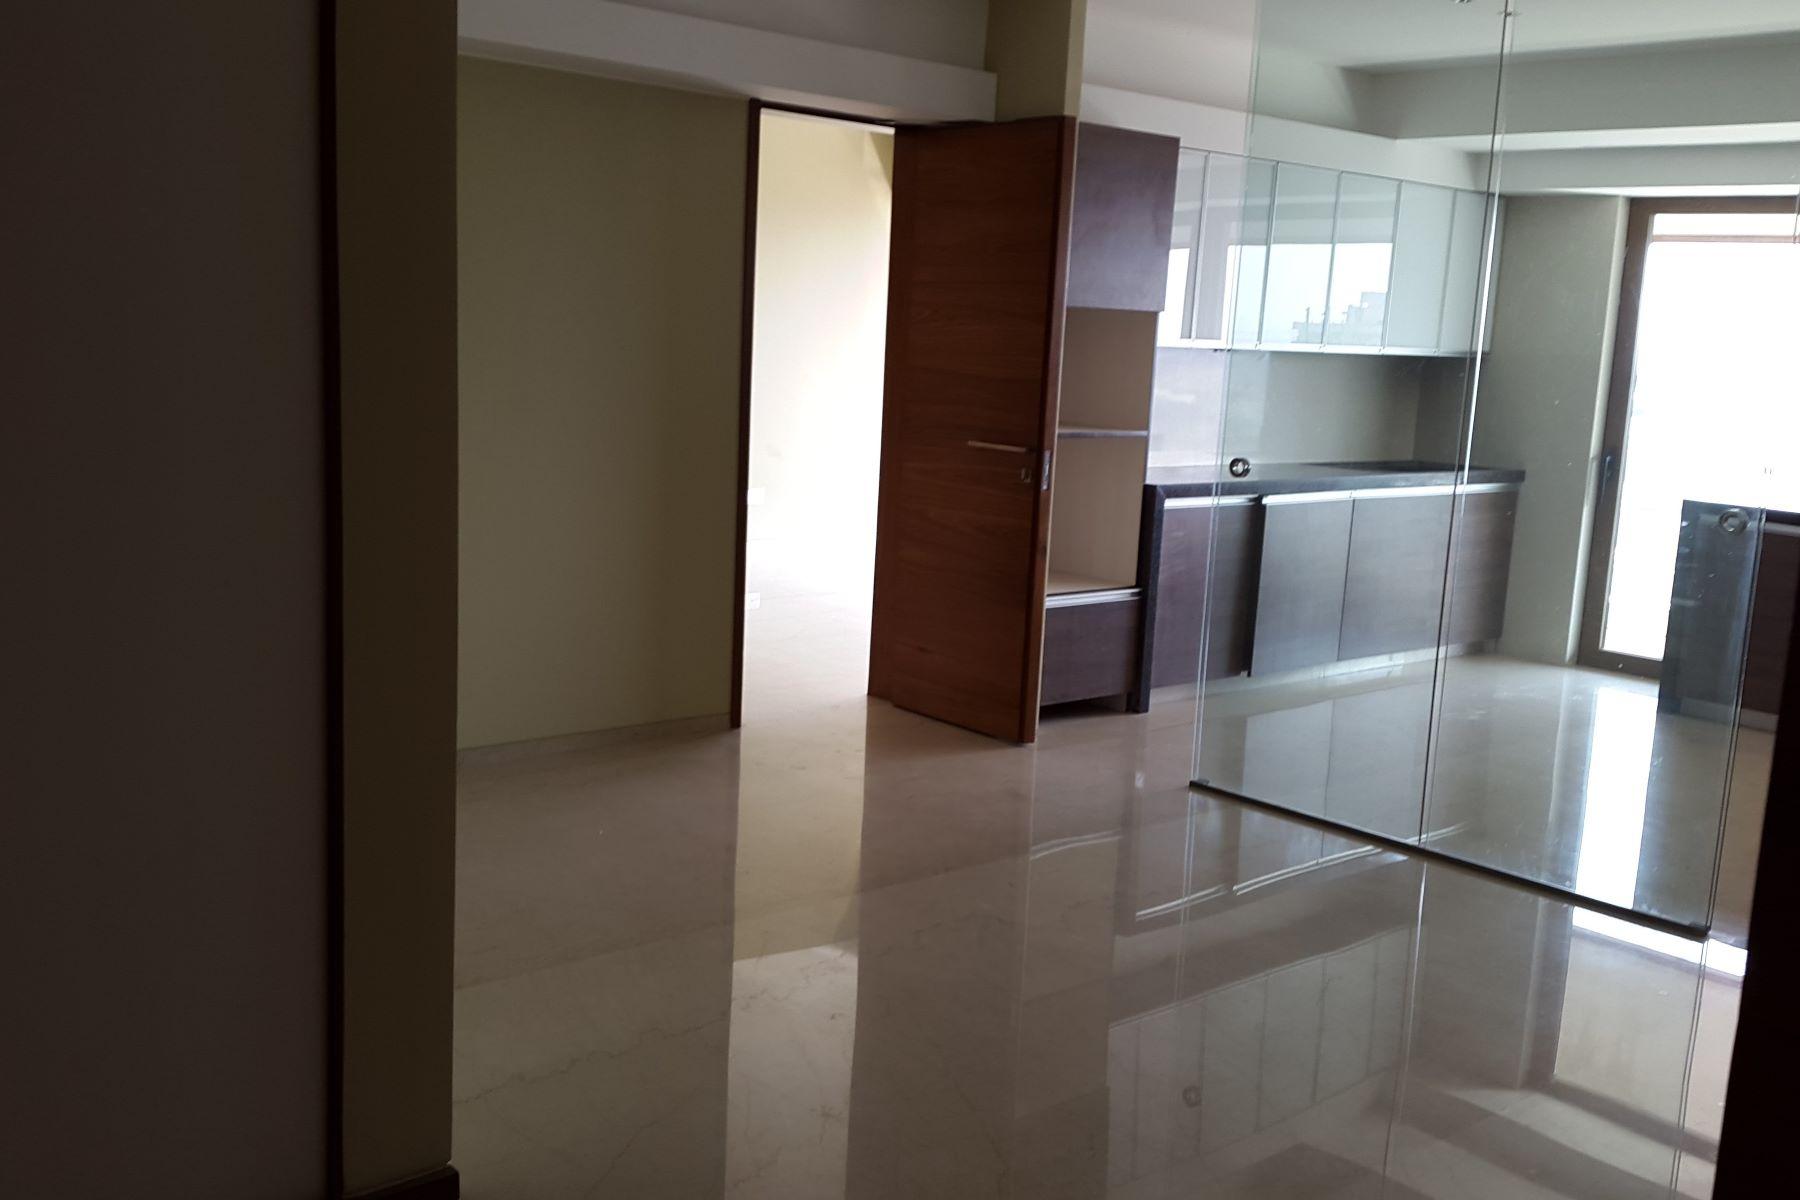 Apartment for Rent at Mumbai- Luxury Apartment in Puja Casa Union Park Road Pali Hill Mumbai, Maharashtra 400050 India